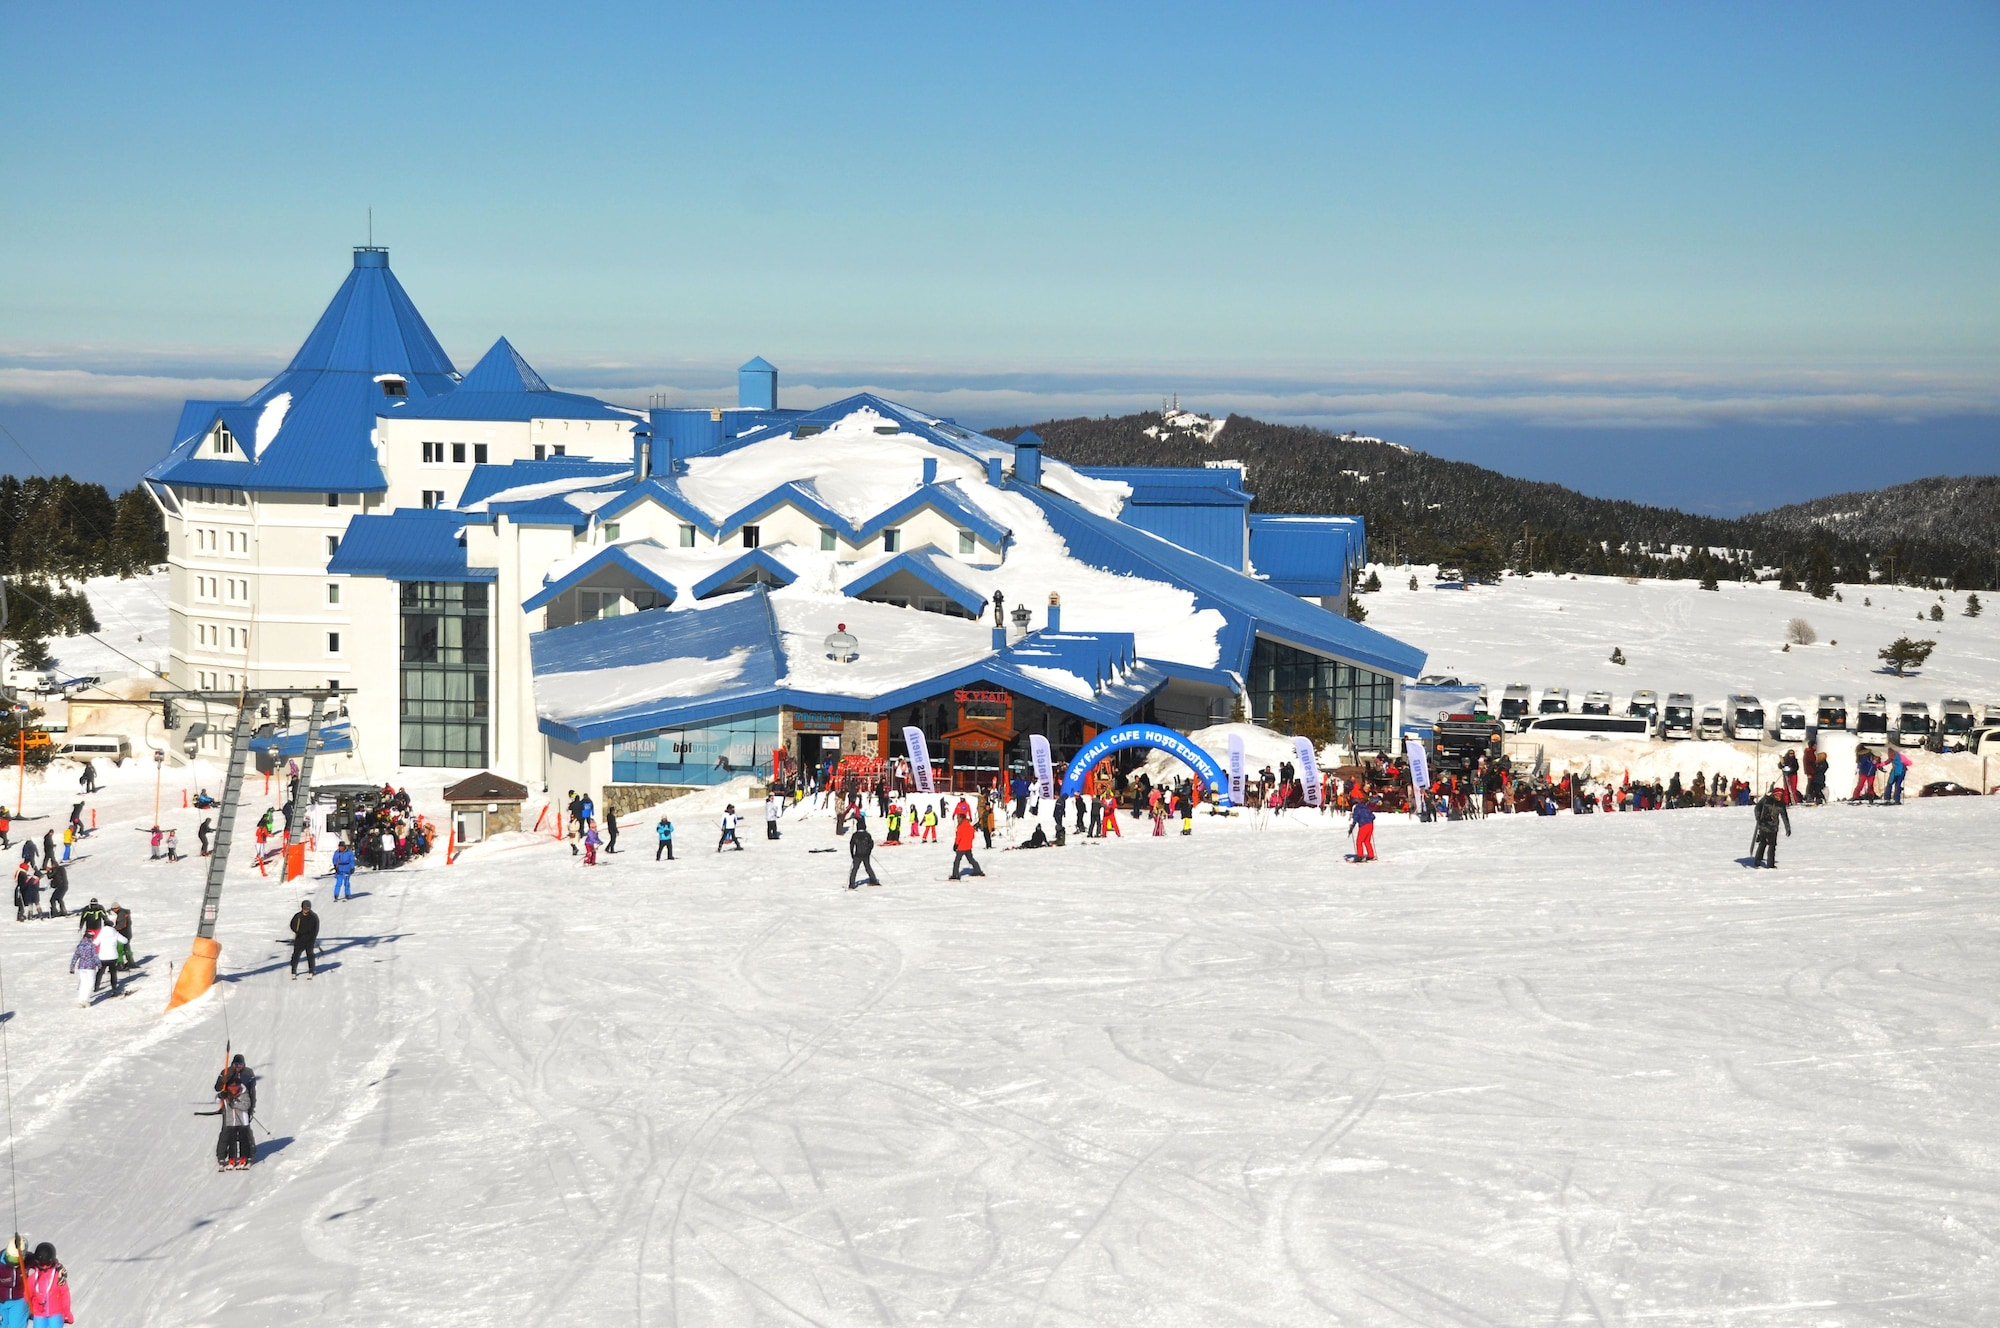 Bof Hotels Uludag Ski & Convention Resort - All Inclusive, Kestel